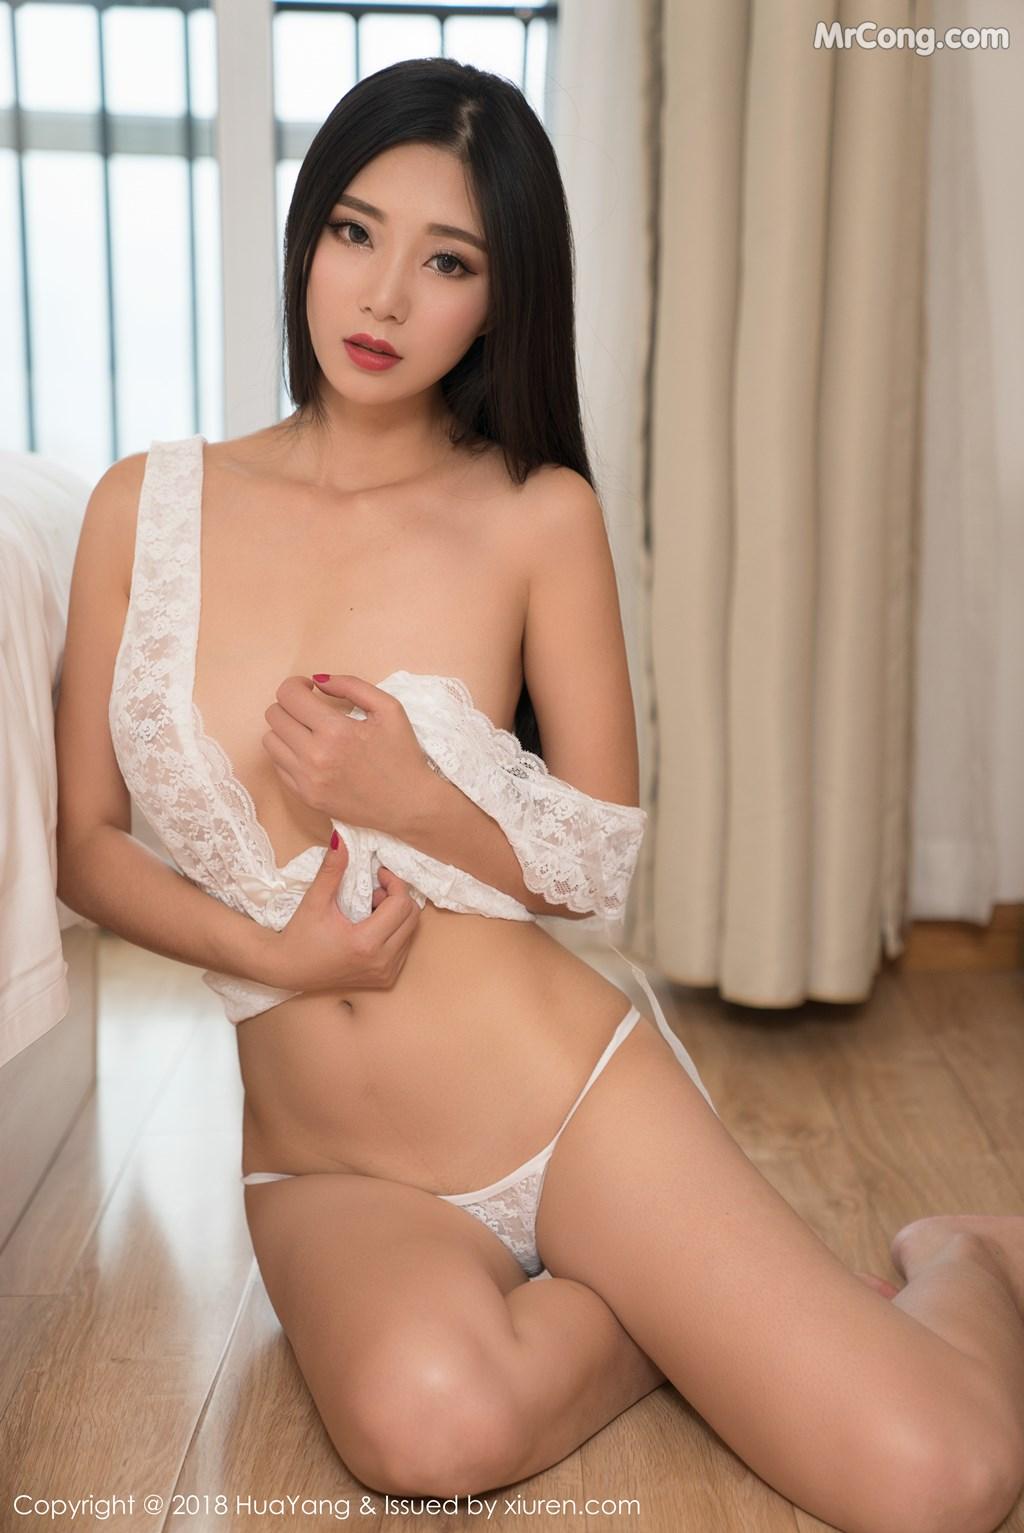 Image HuaYang-2018-02-28-Vol.033-KiKi-MrCong.com-024 in post HuaYang 2018-02-28 Vol.033: Người mẫu 宋-KiKi (42 ảnh)